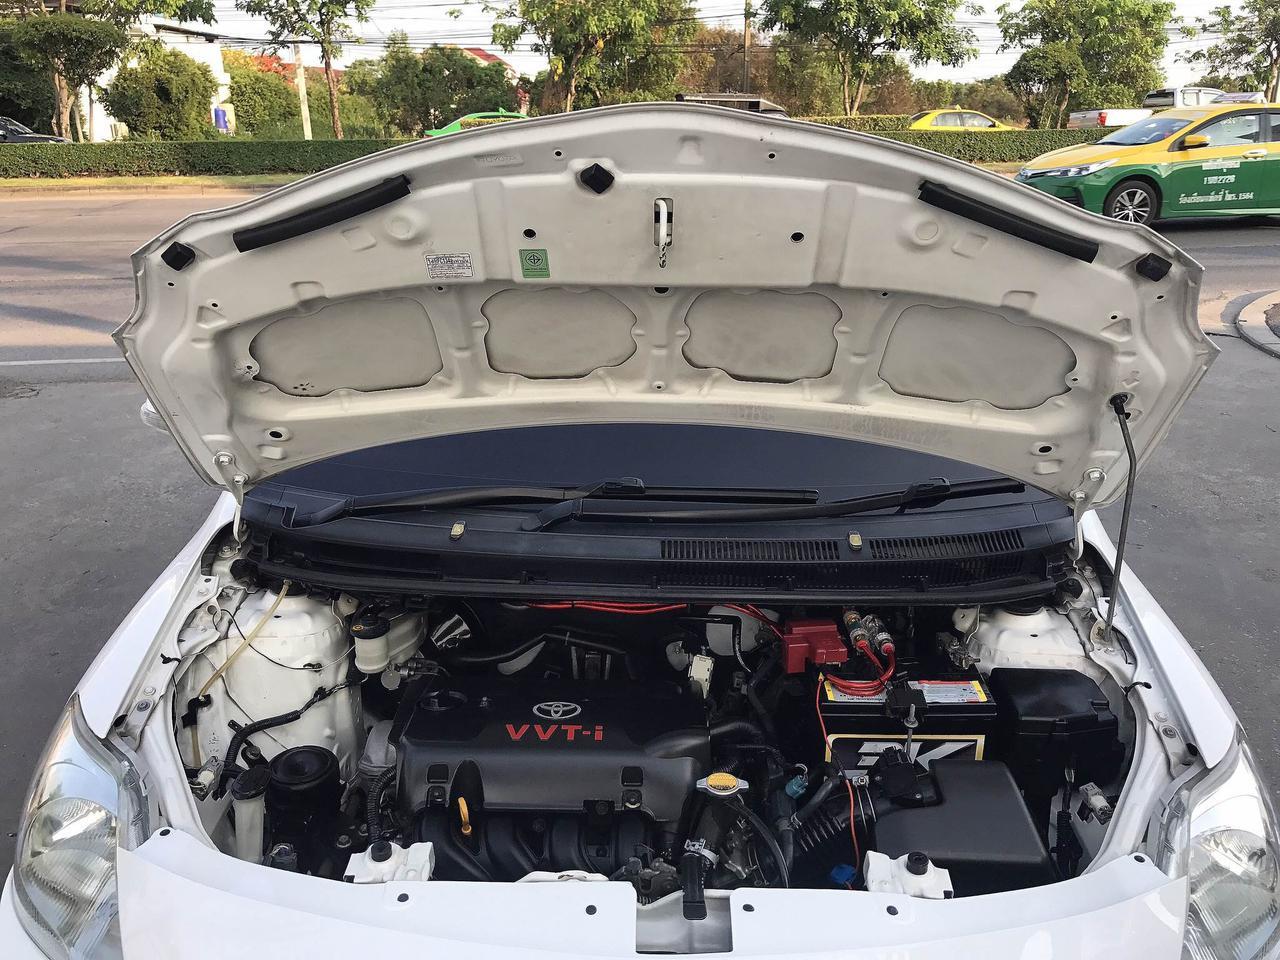 TOYOTA VIOS 1.5G Auto ปี2011 สีขาว รถบ้านมือเดียว รูปที่ 6